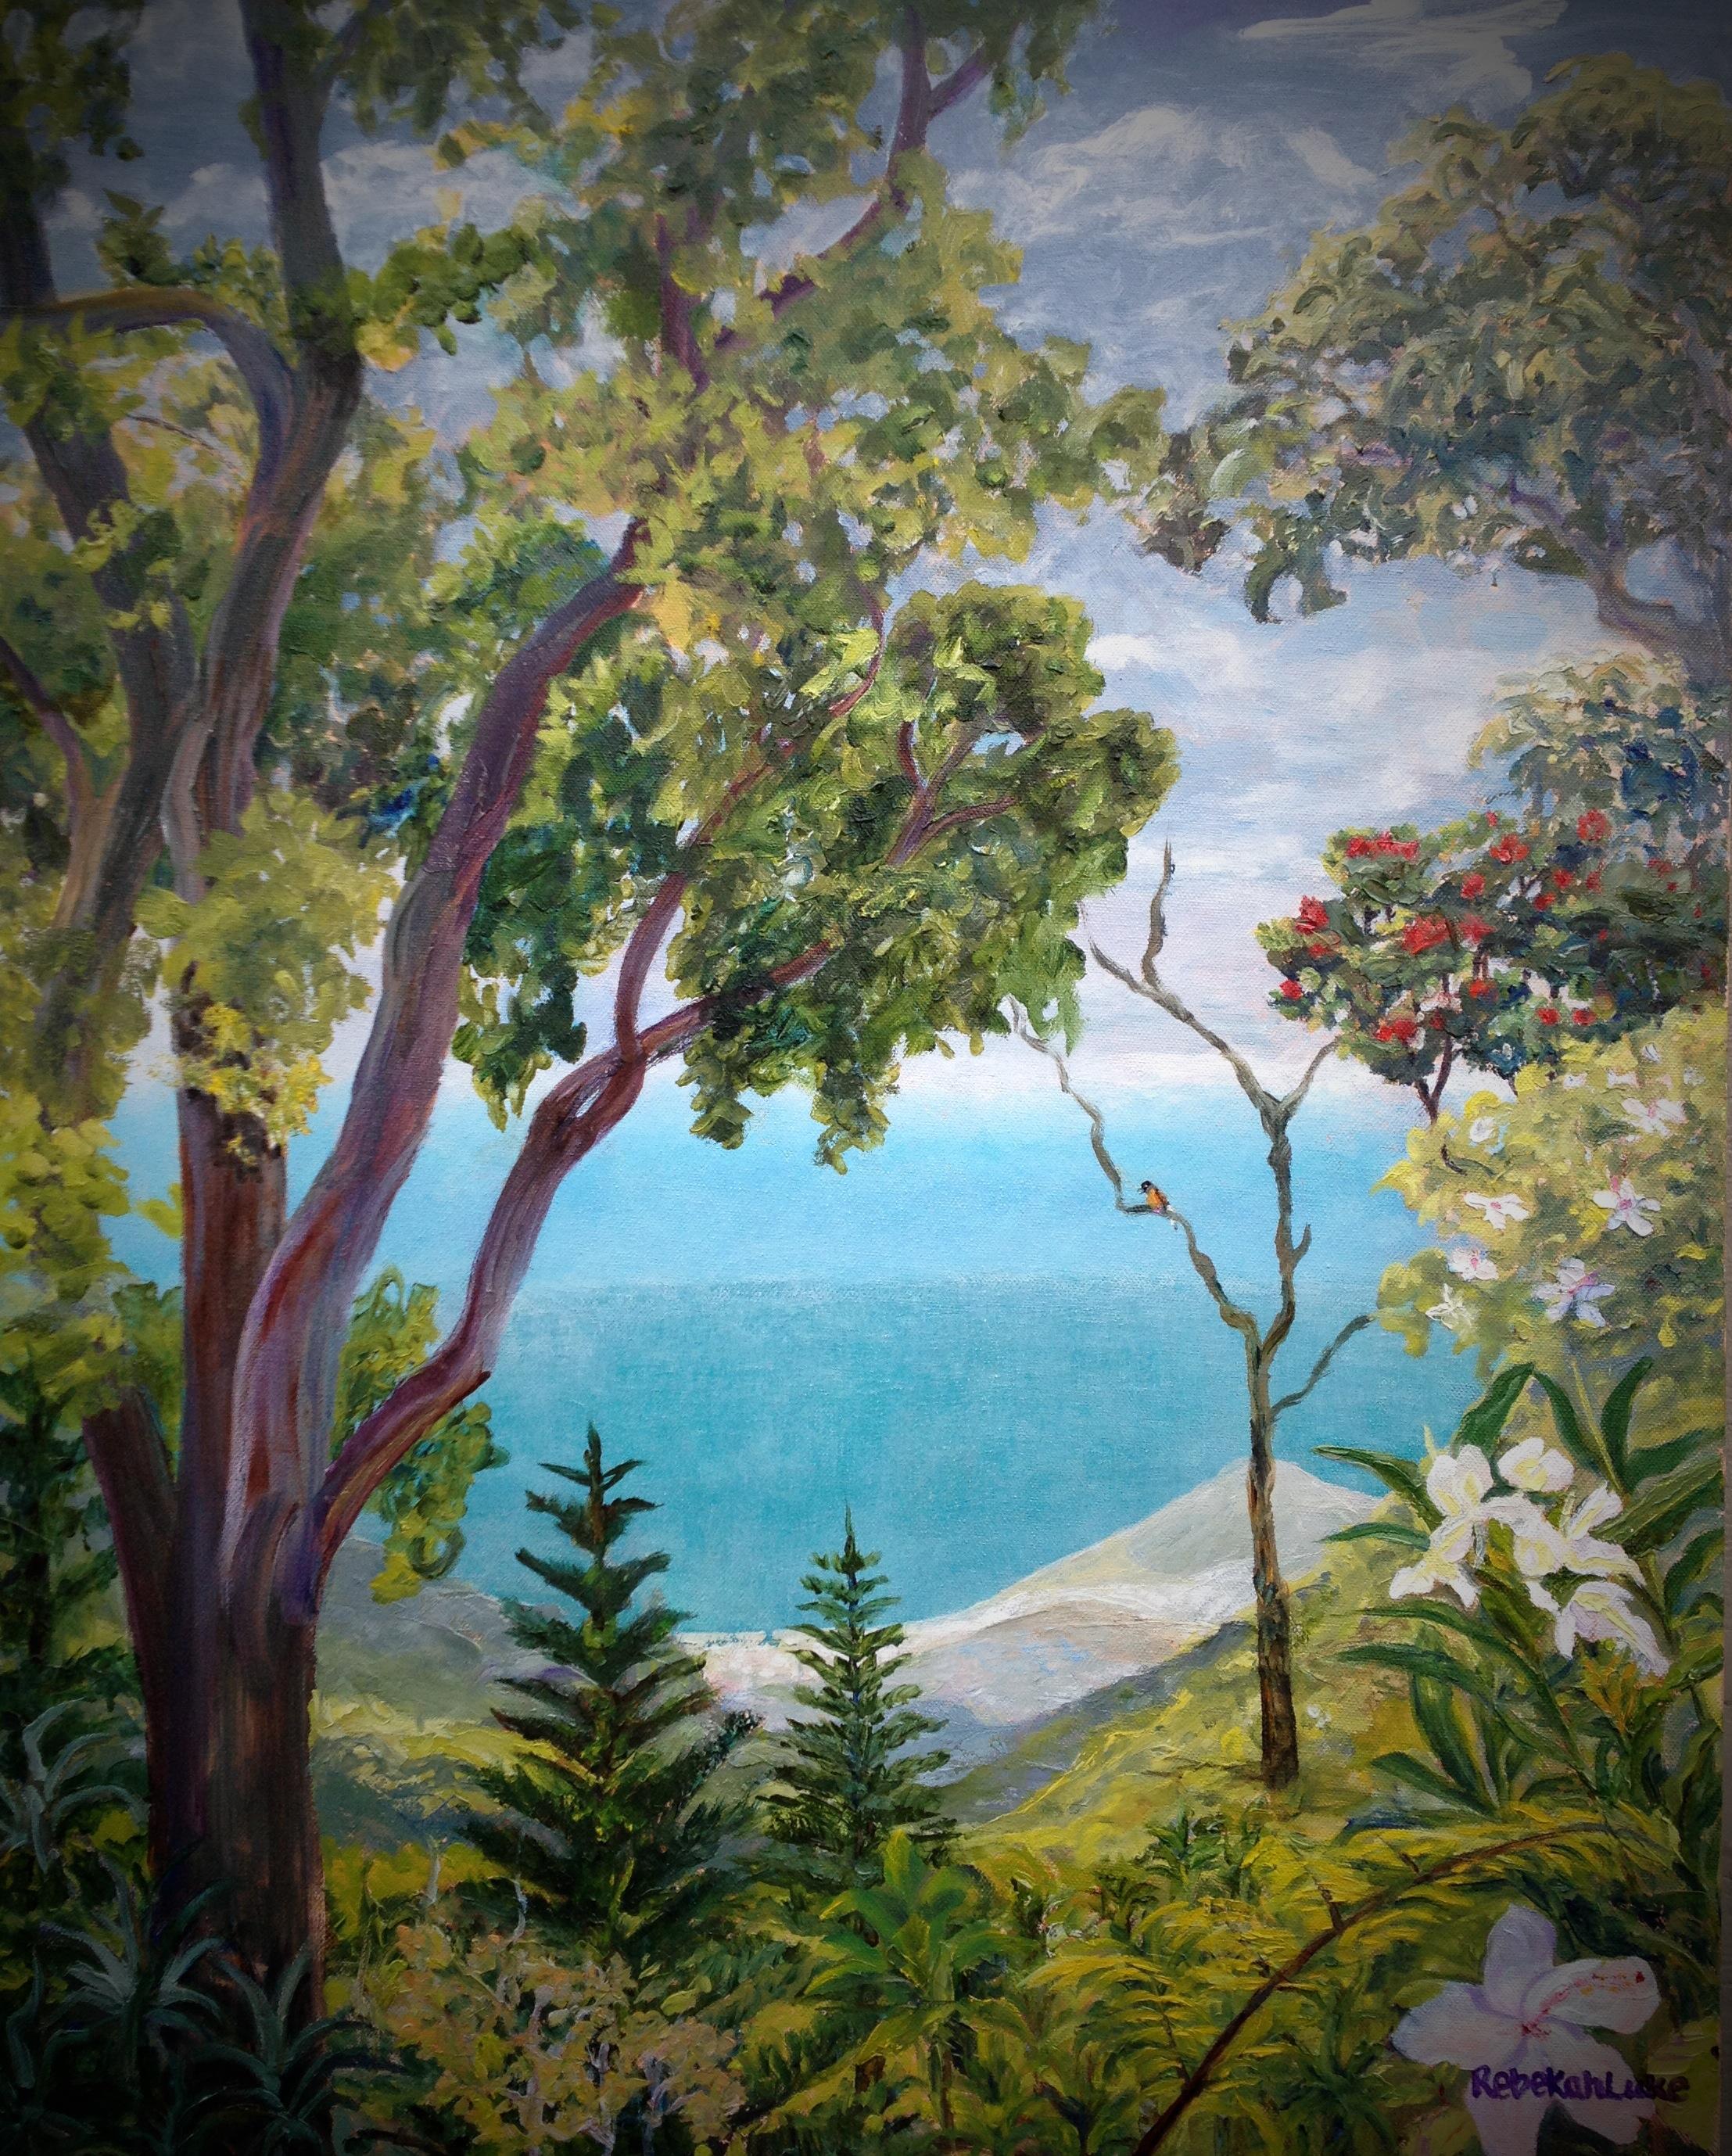 Tantalus View from Pu'u 'Ōhiʻa - 2014 - Robert Tam Collection